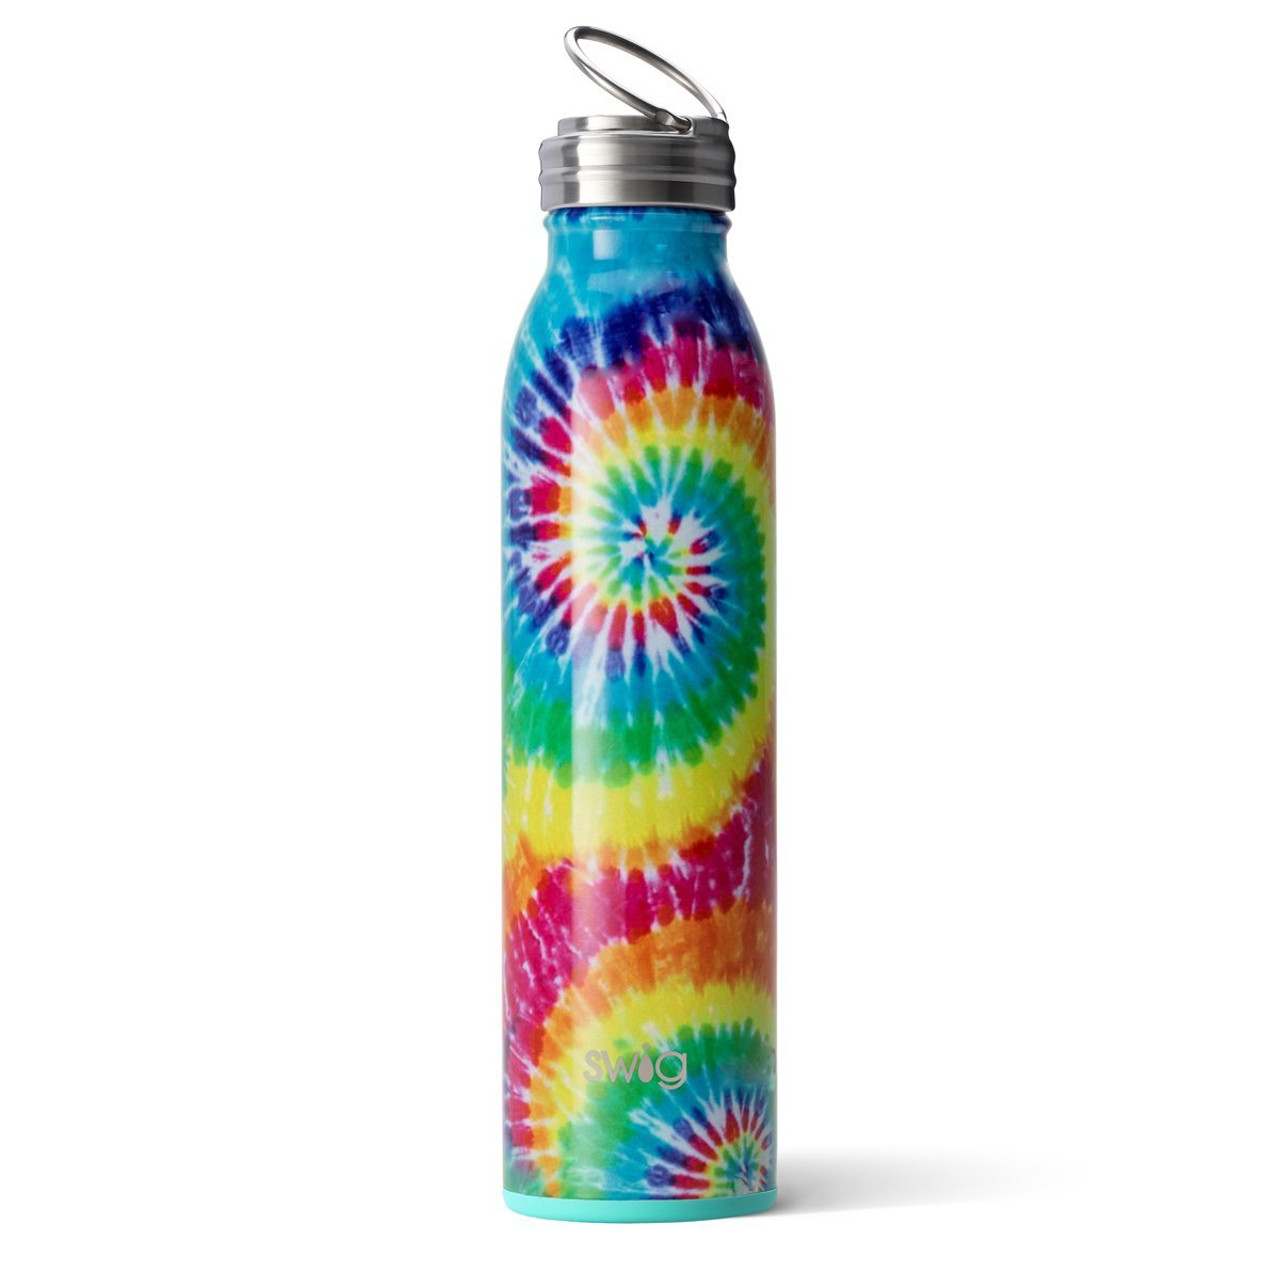 swirled peace bottle